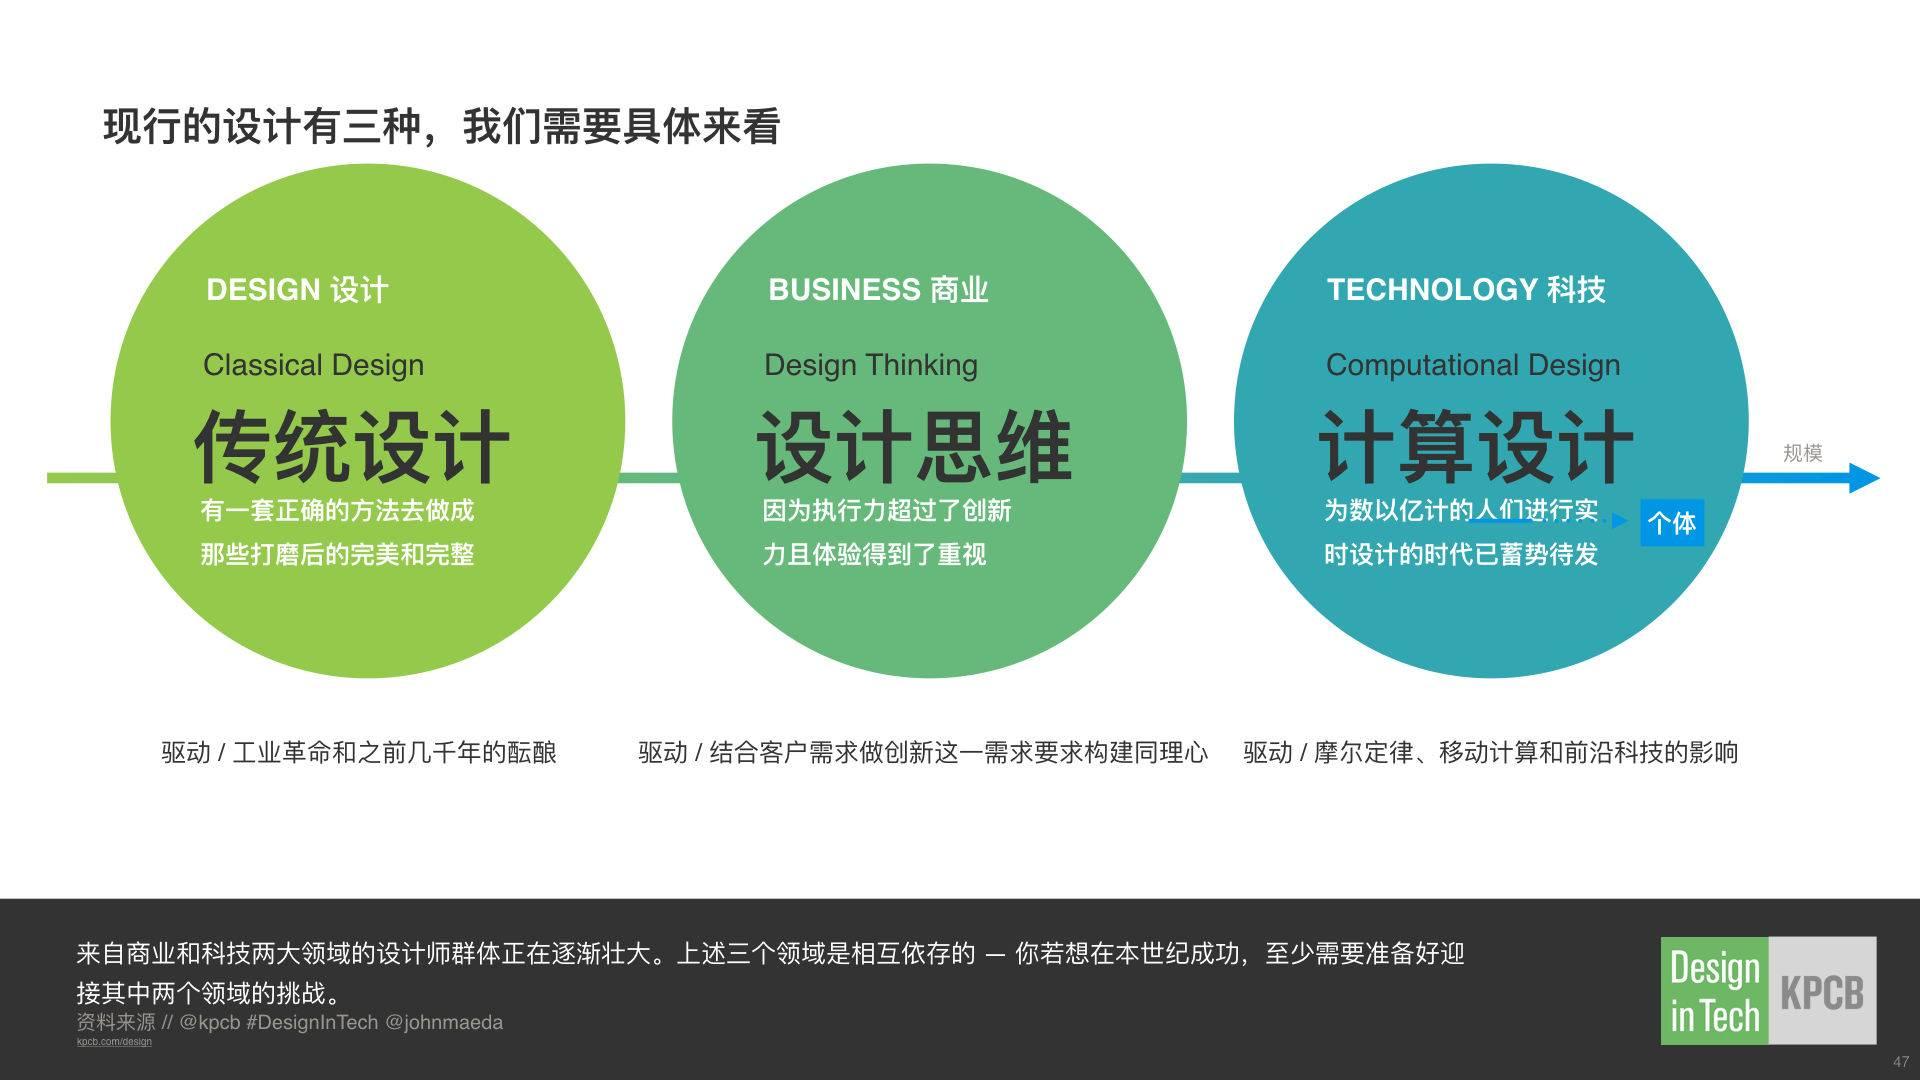 2016DesignInTech科技中的设计(Chinese).047.jpeg